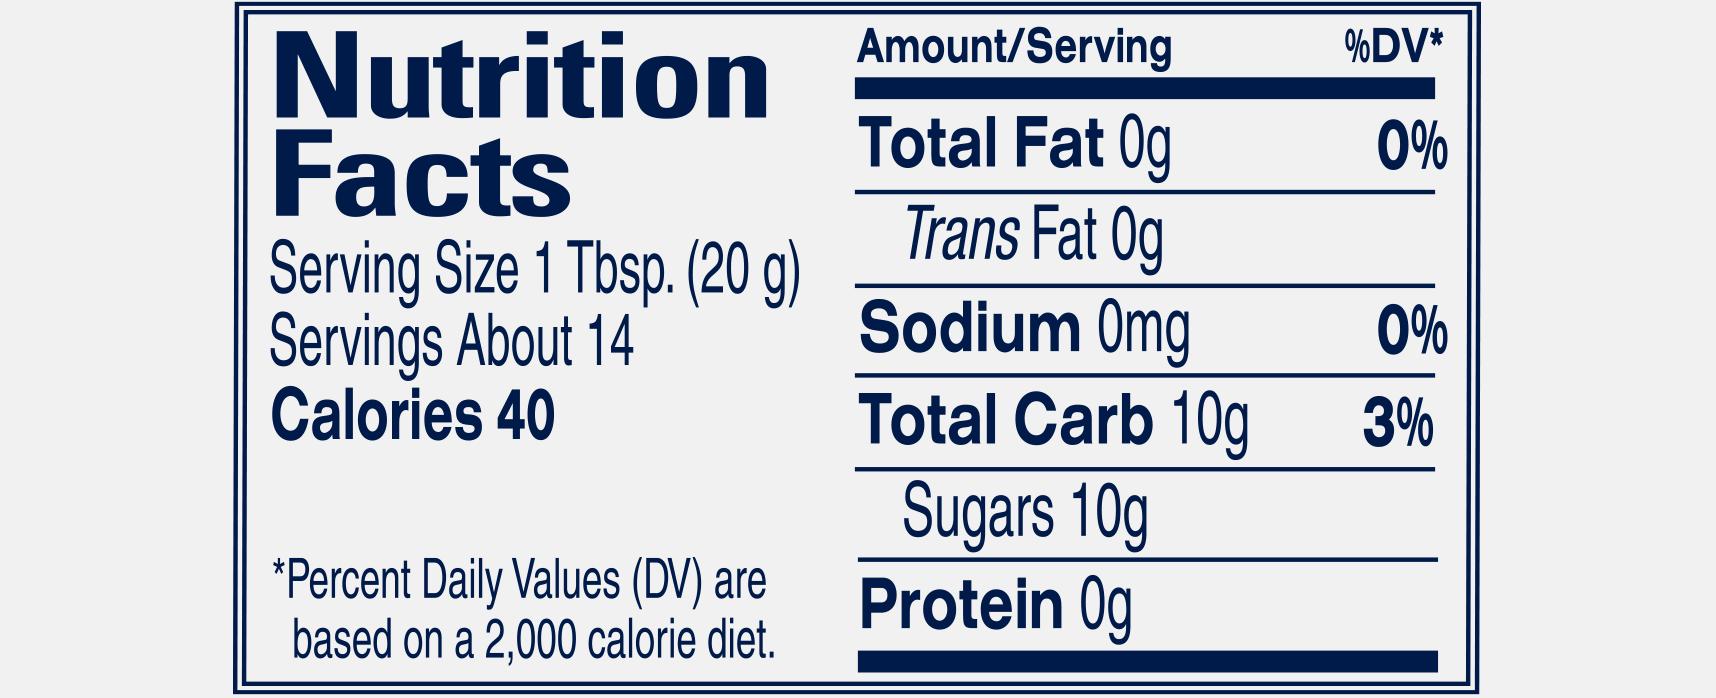 StDalfour_NutritionFacts_MangoPassionFruit.png